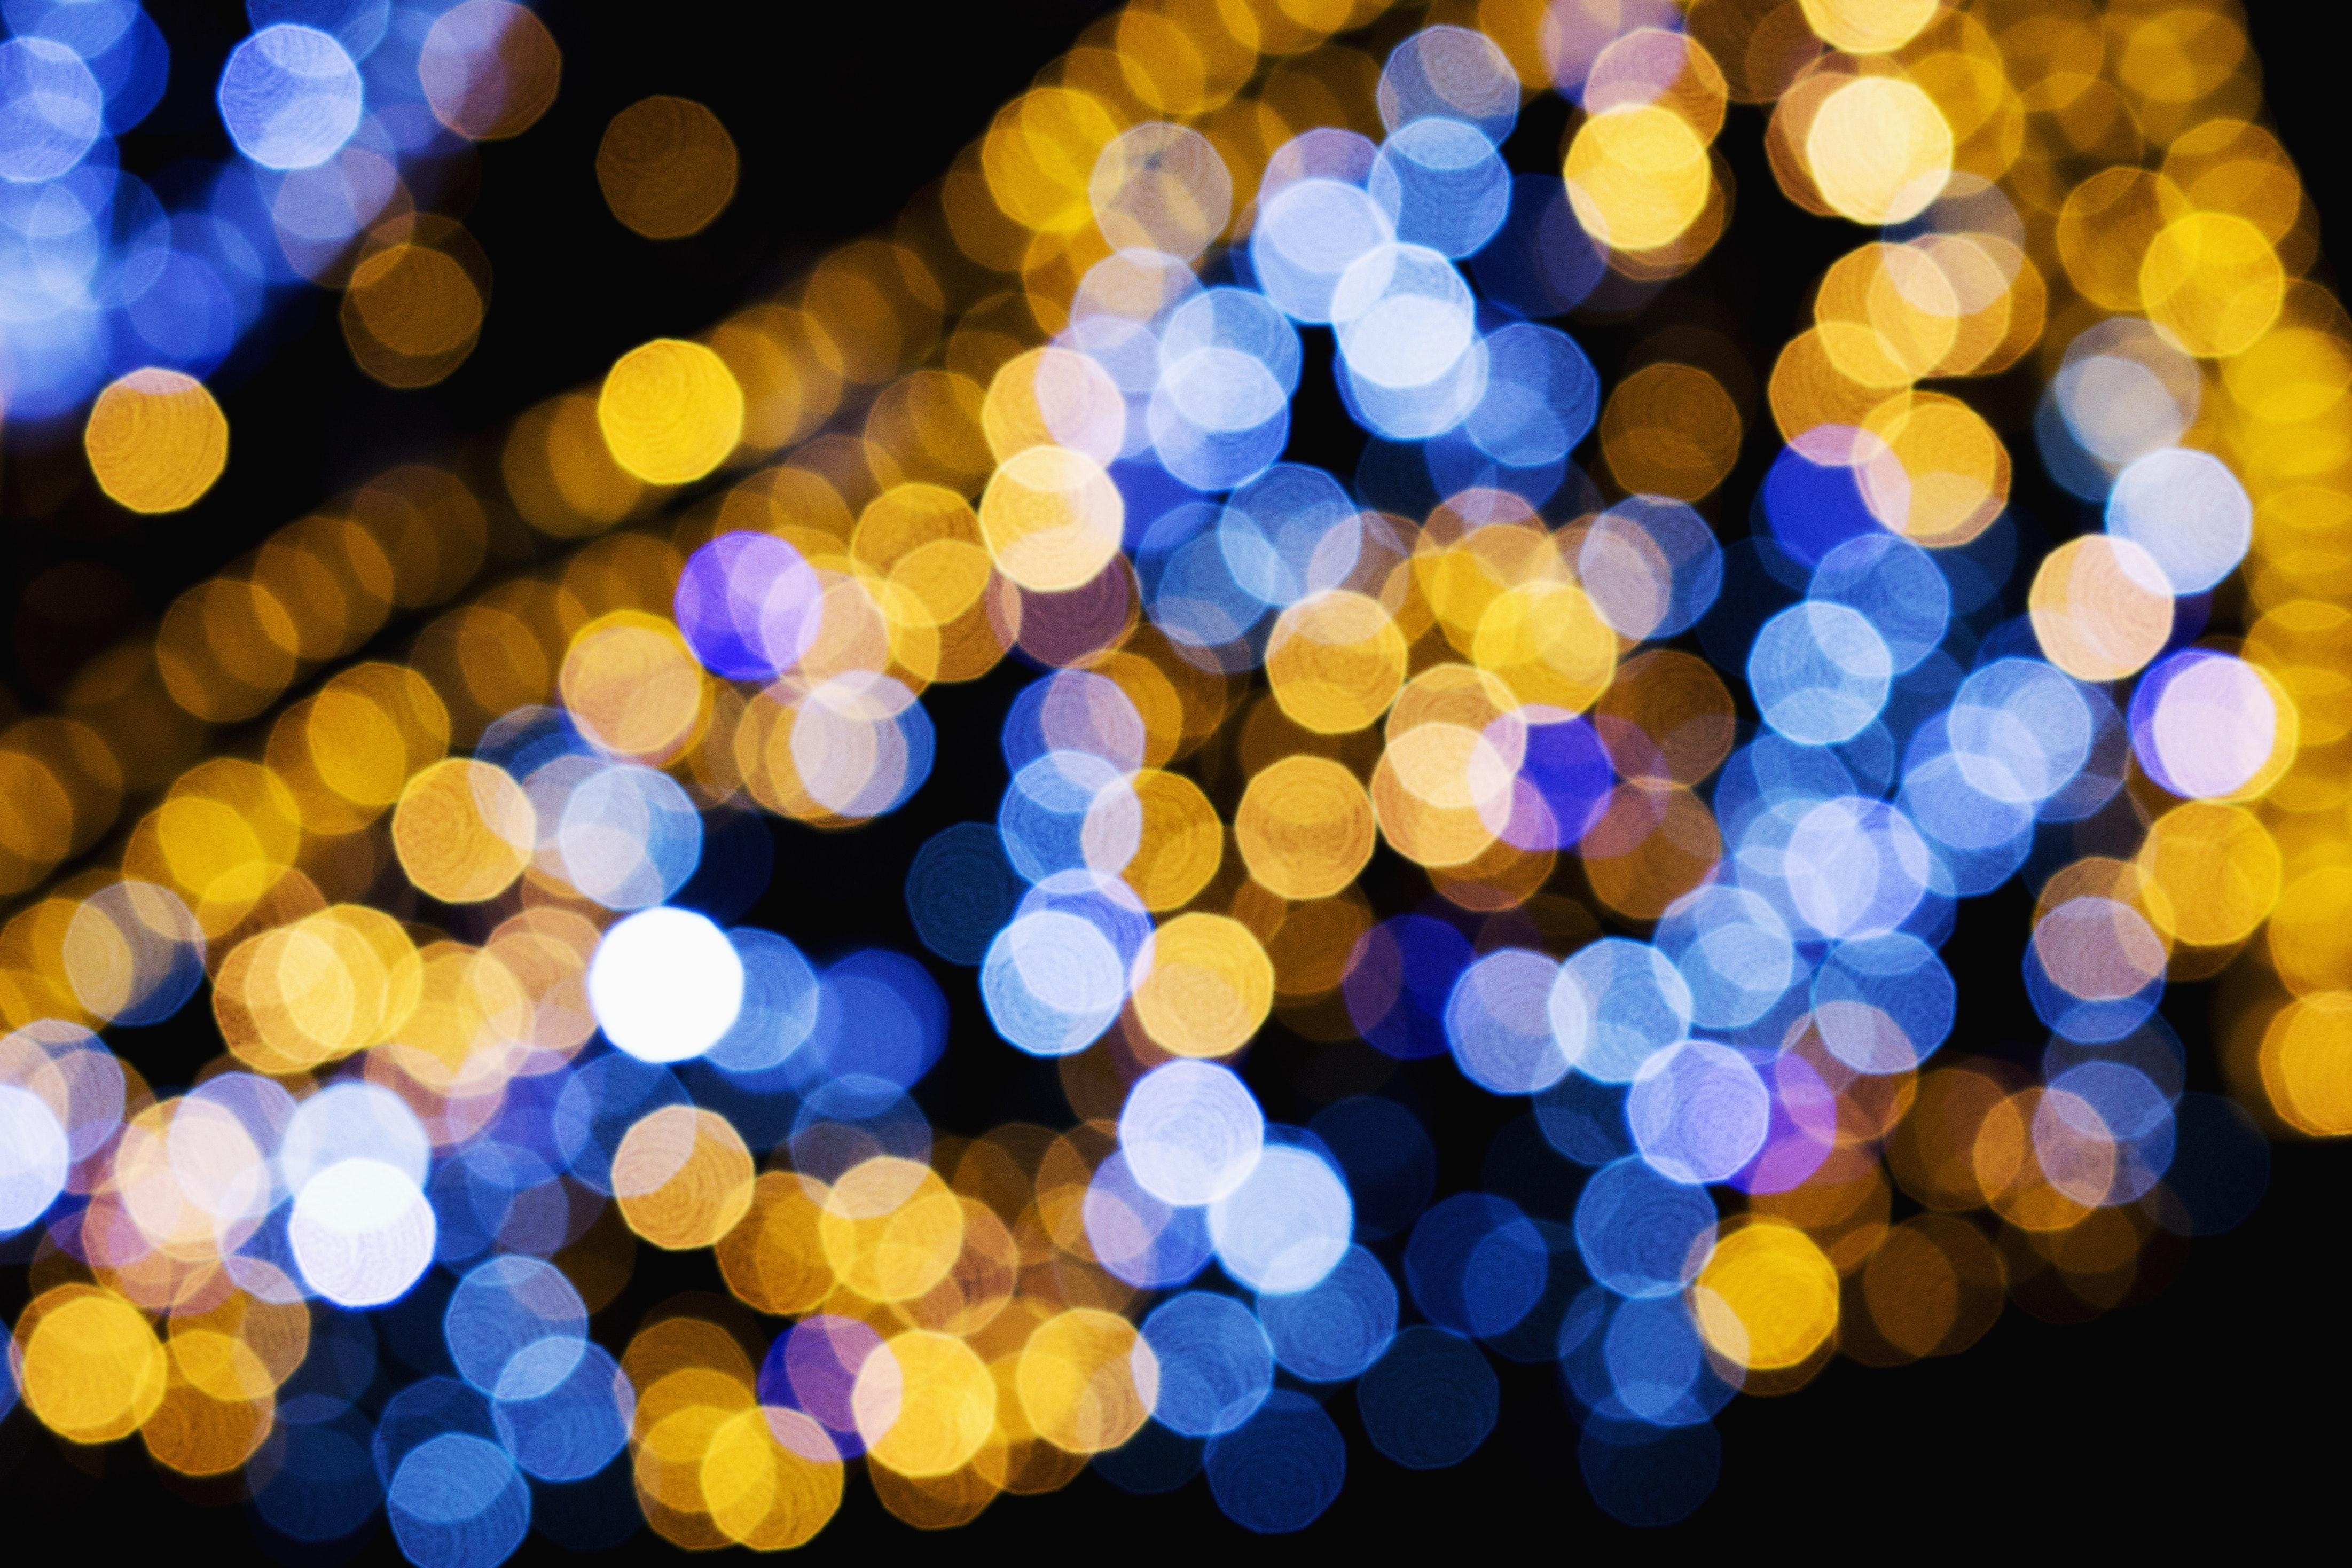 Macro shot of yellow and blue lights photo